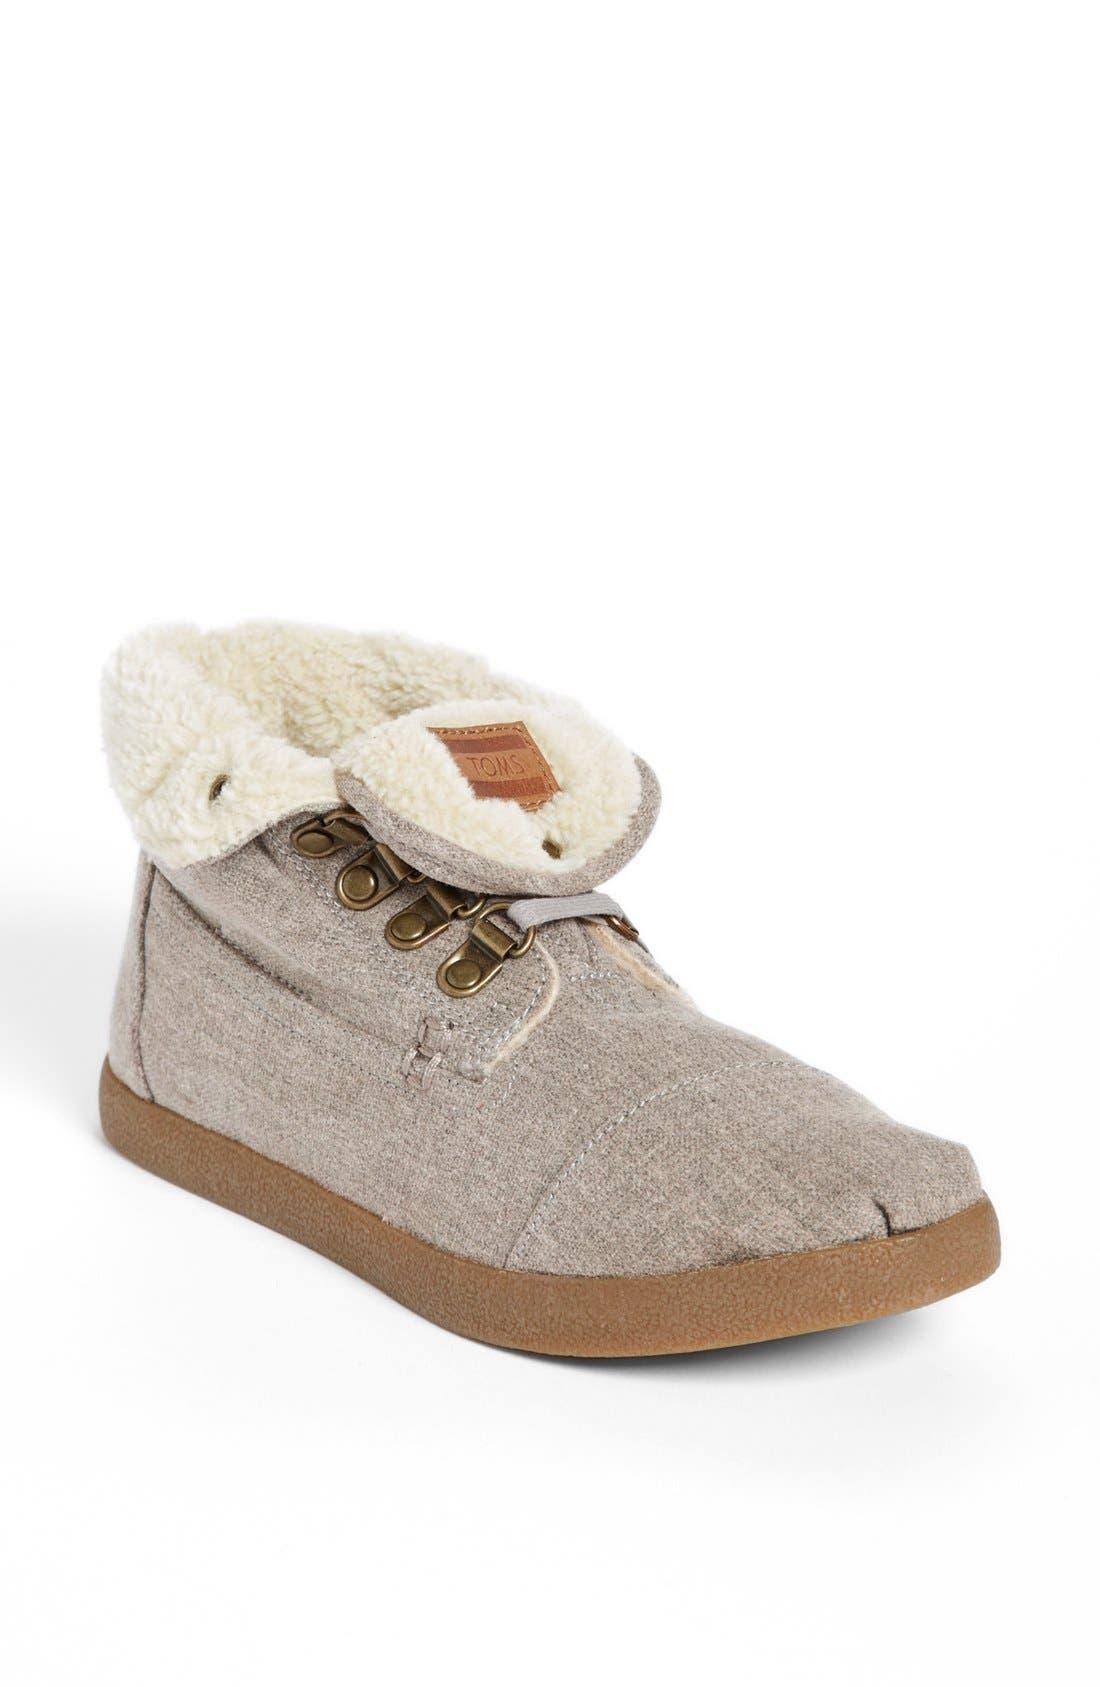 Alternate Image 1 Selected - TOMS 'High Botas' Fleece Boot (Women)